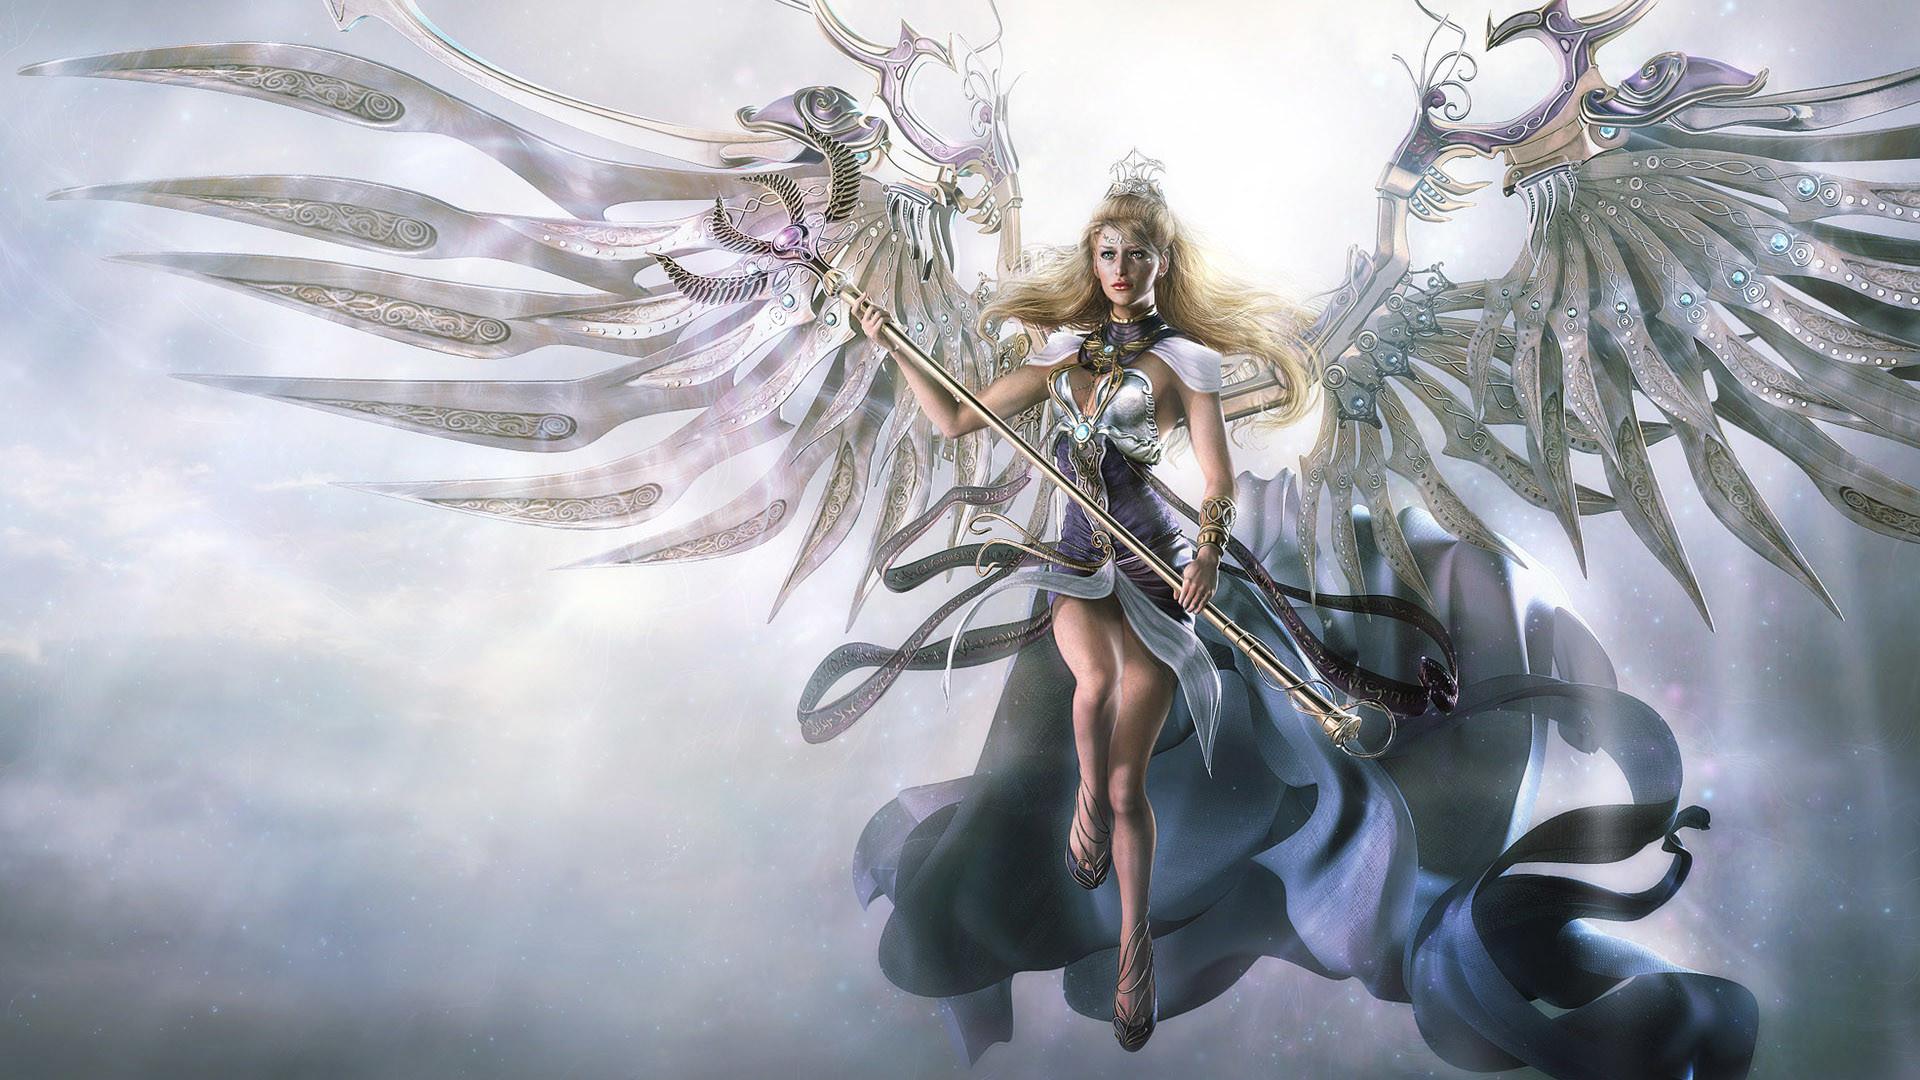 Angels Wallpaper 1920x1080 (77+ images)